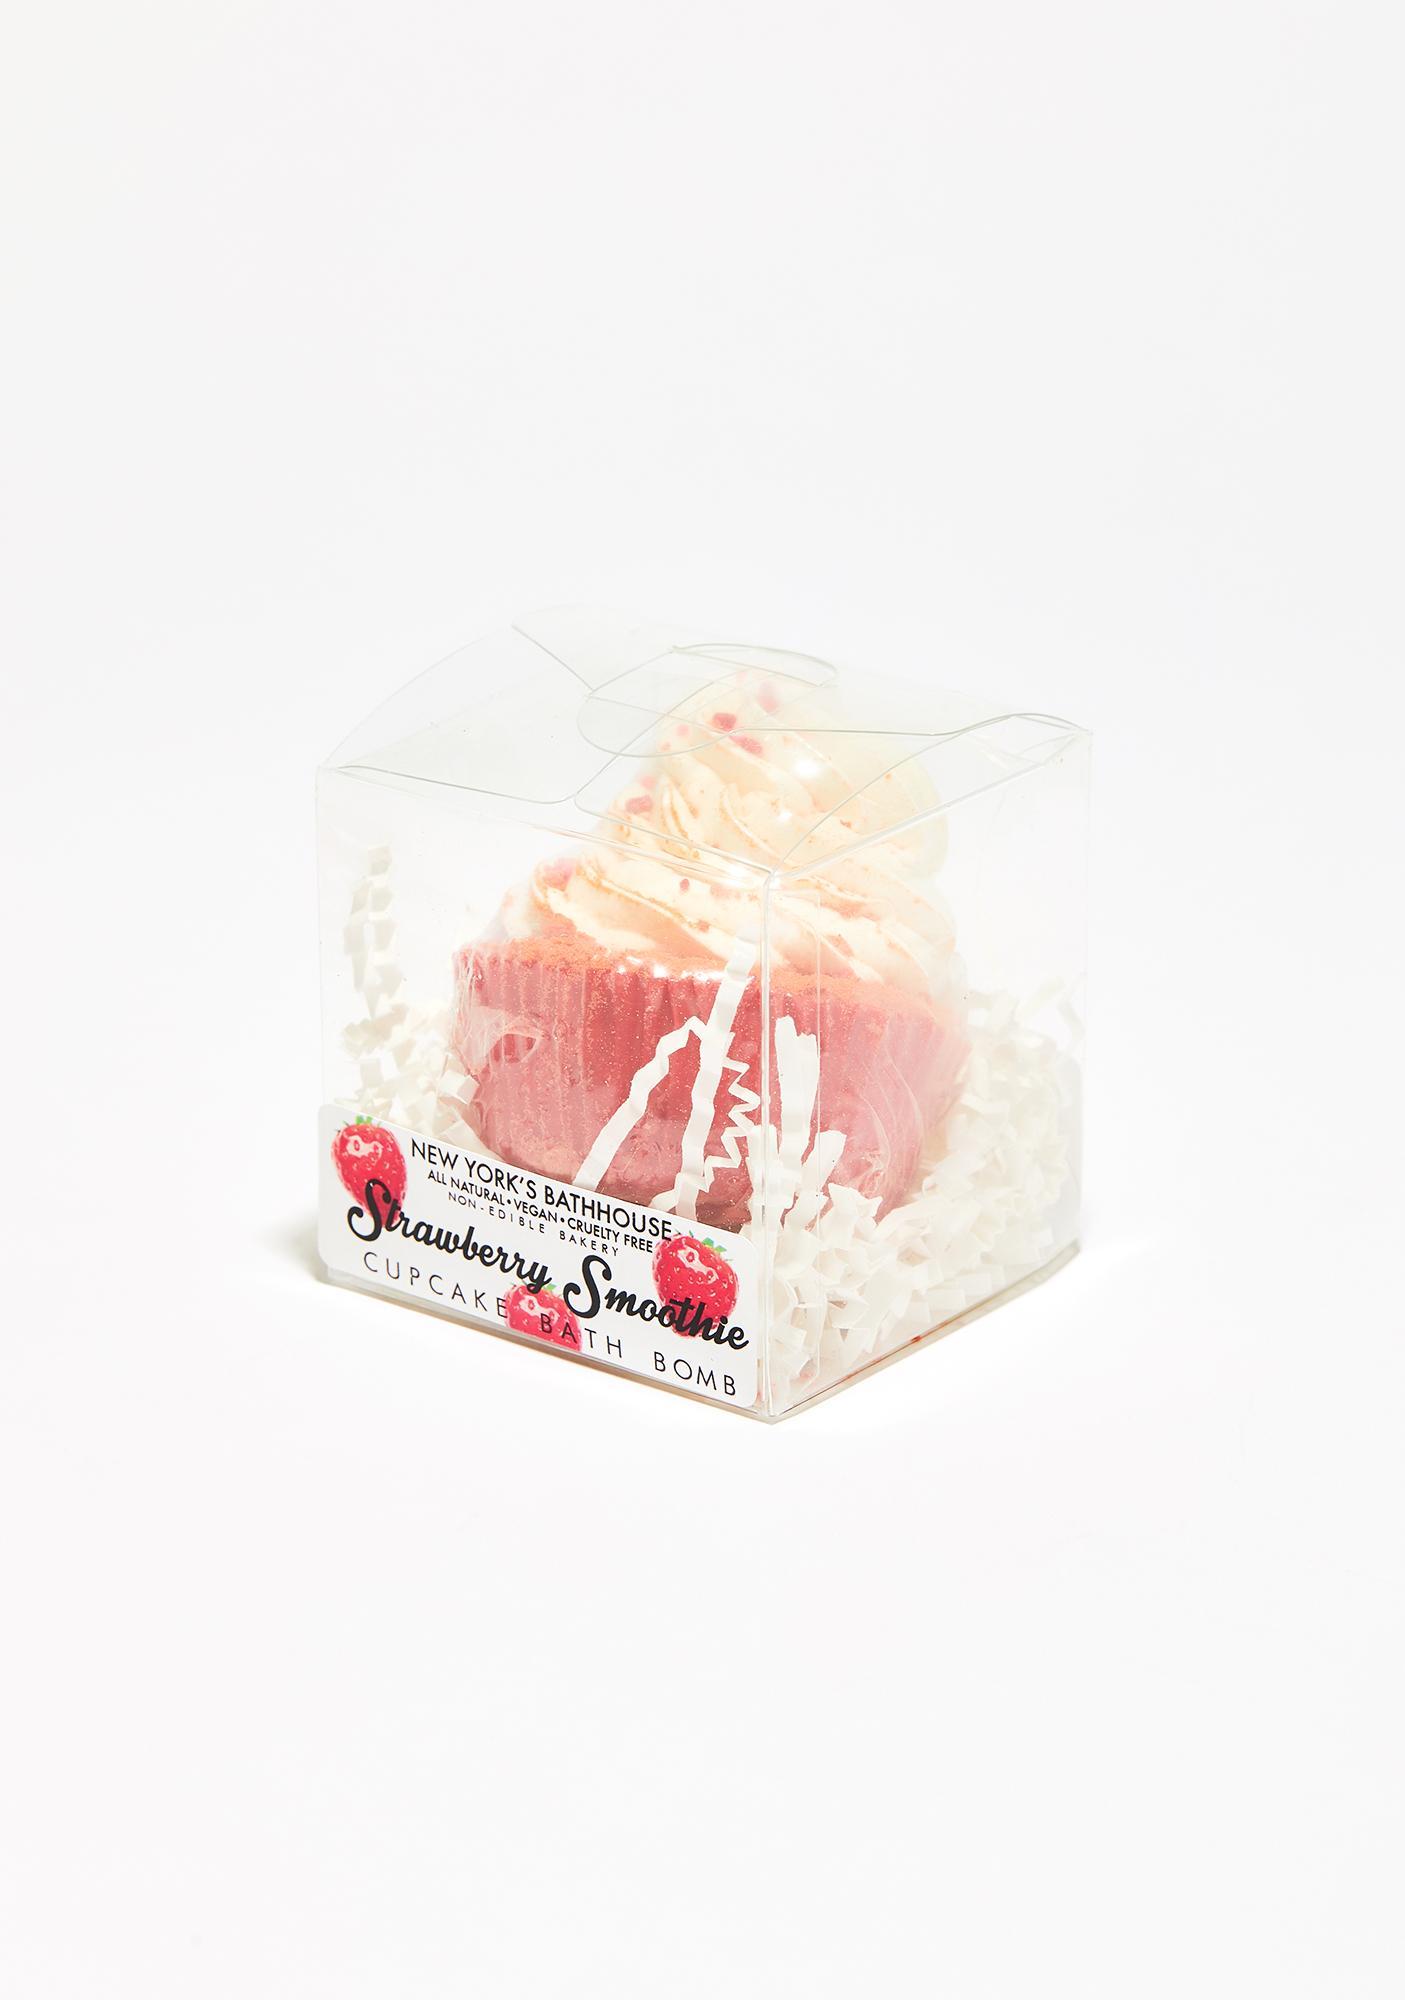 New York's Bathhouse Strawberry Smoothie Cupcake Bath Bomb